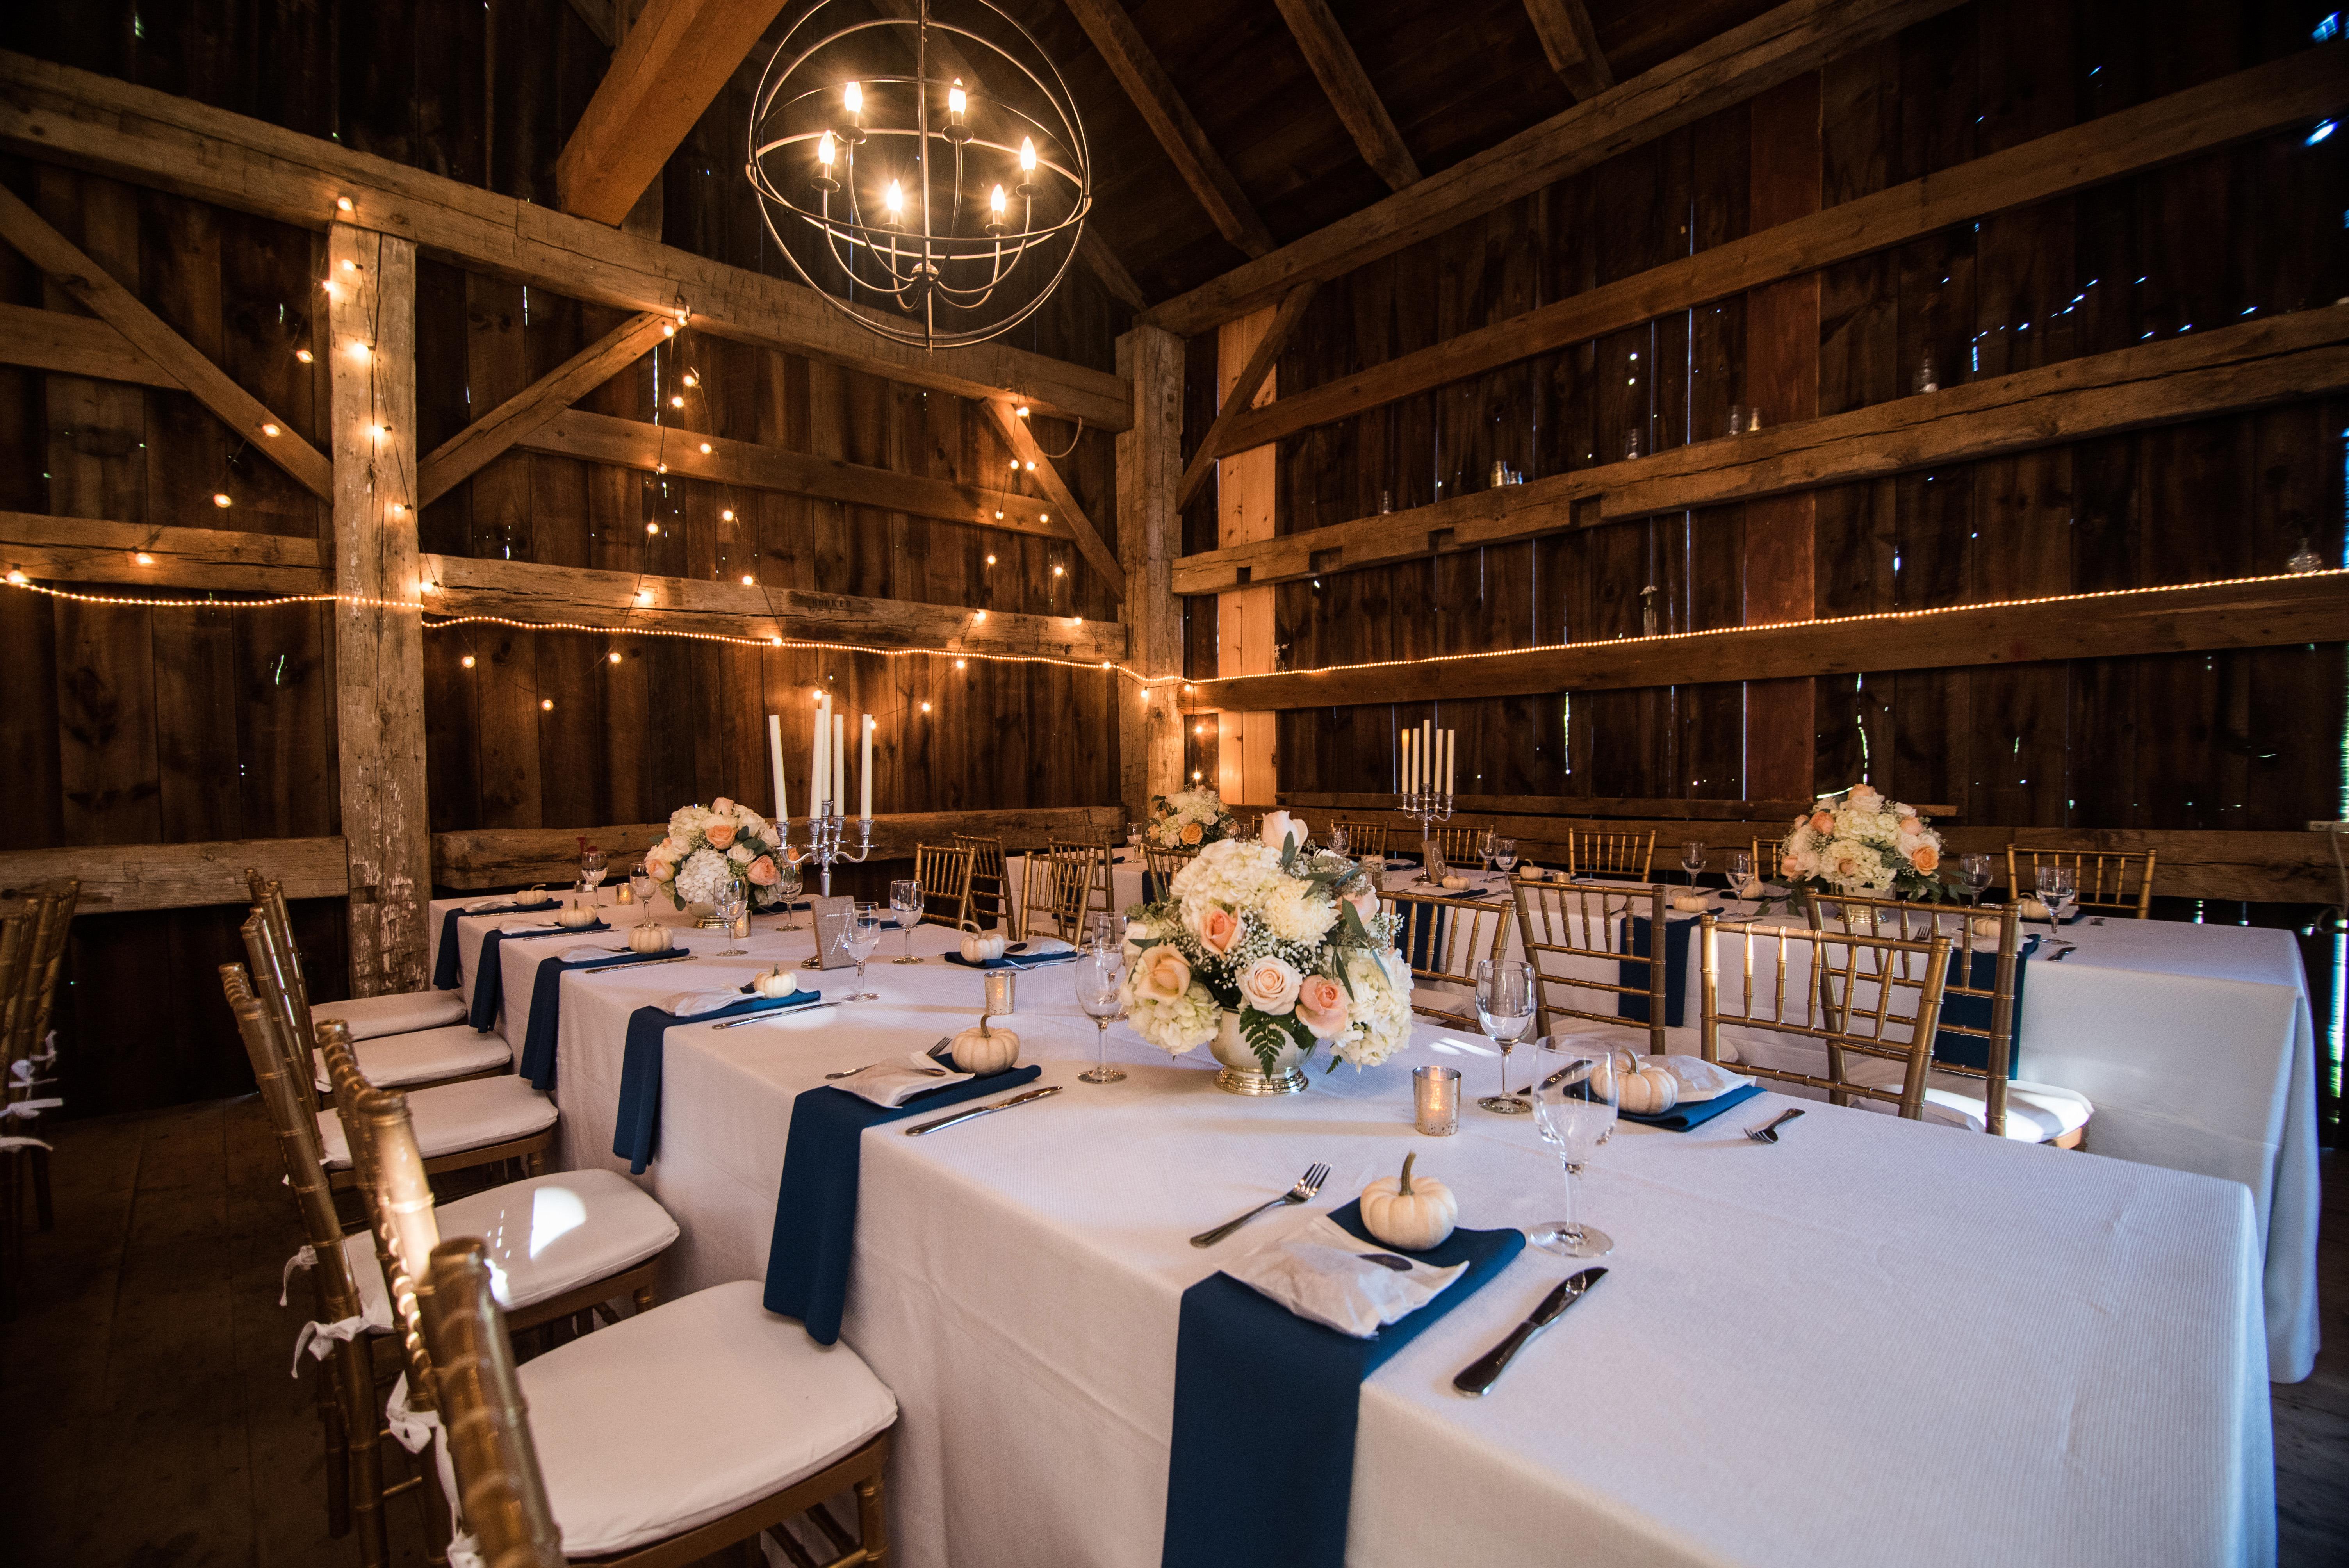 Elaina Amp Roberts Rustic Fall Barn Wedding On Long Island Rustic Weddings